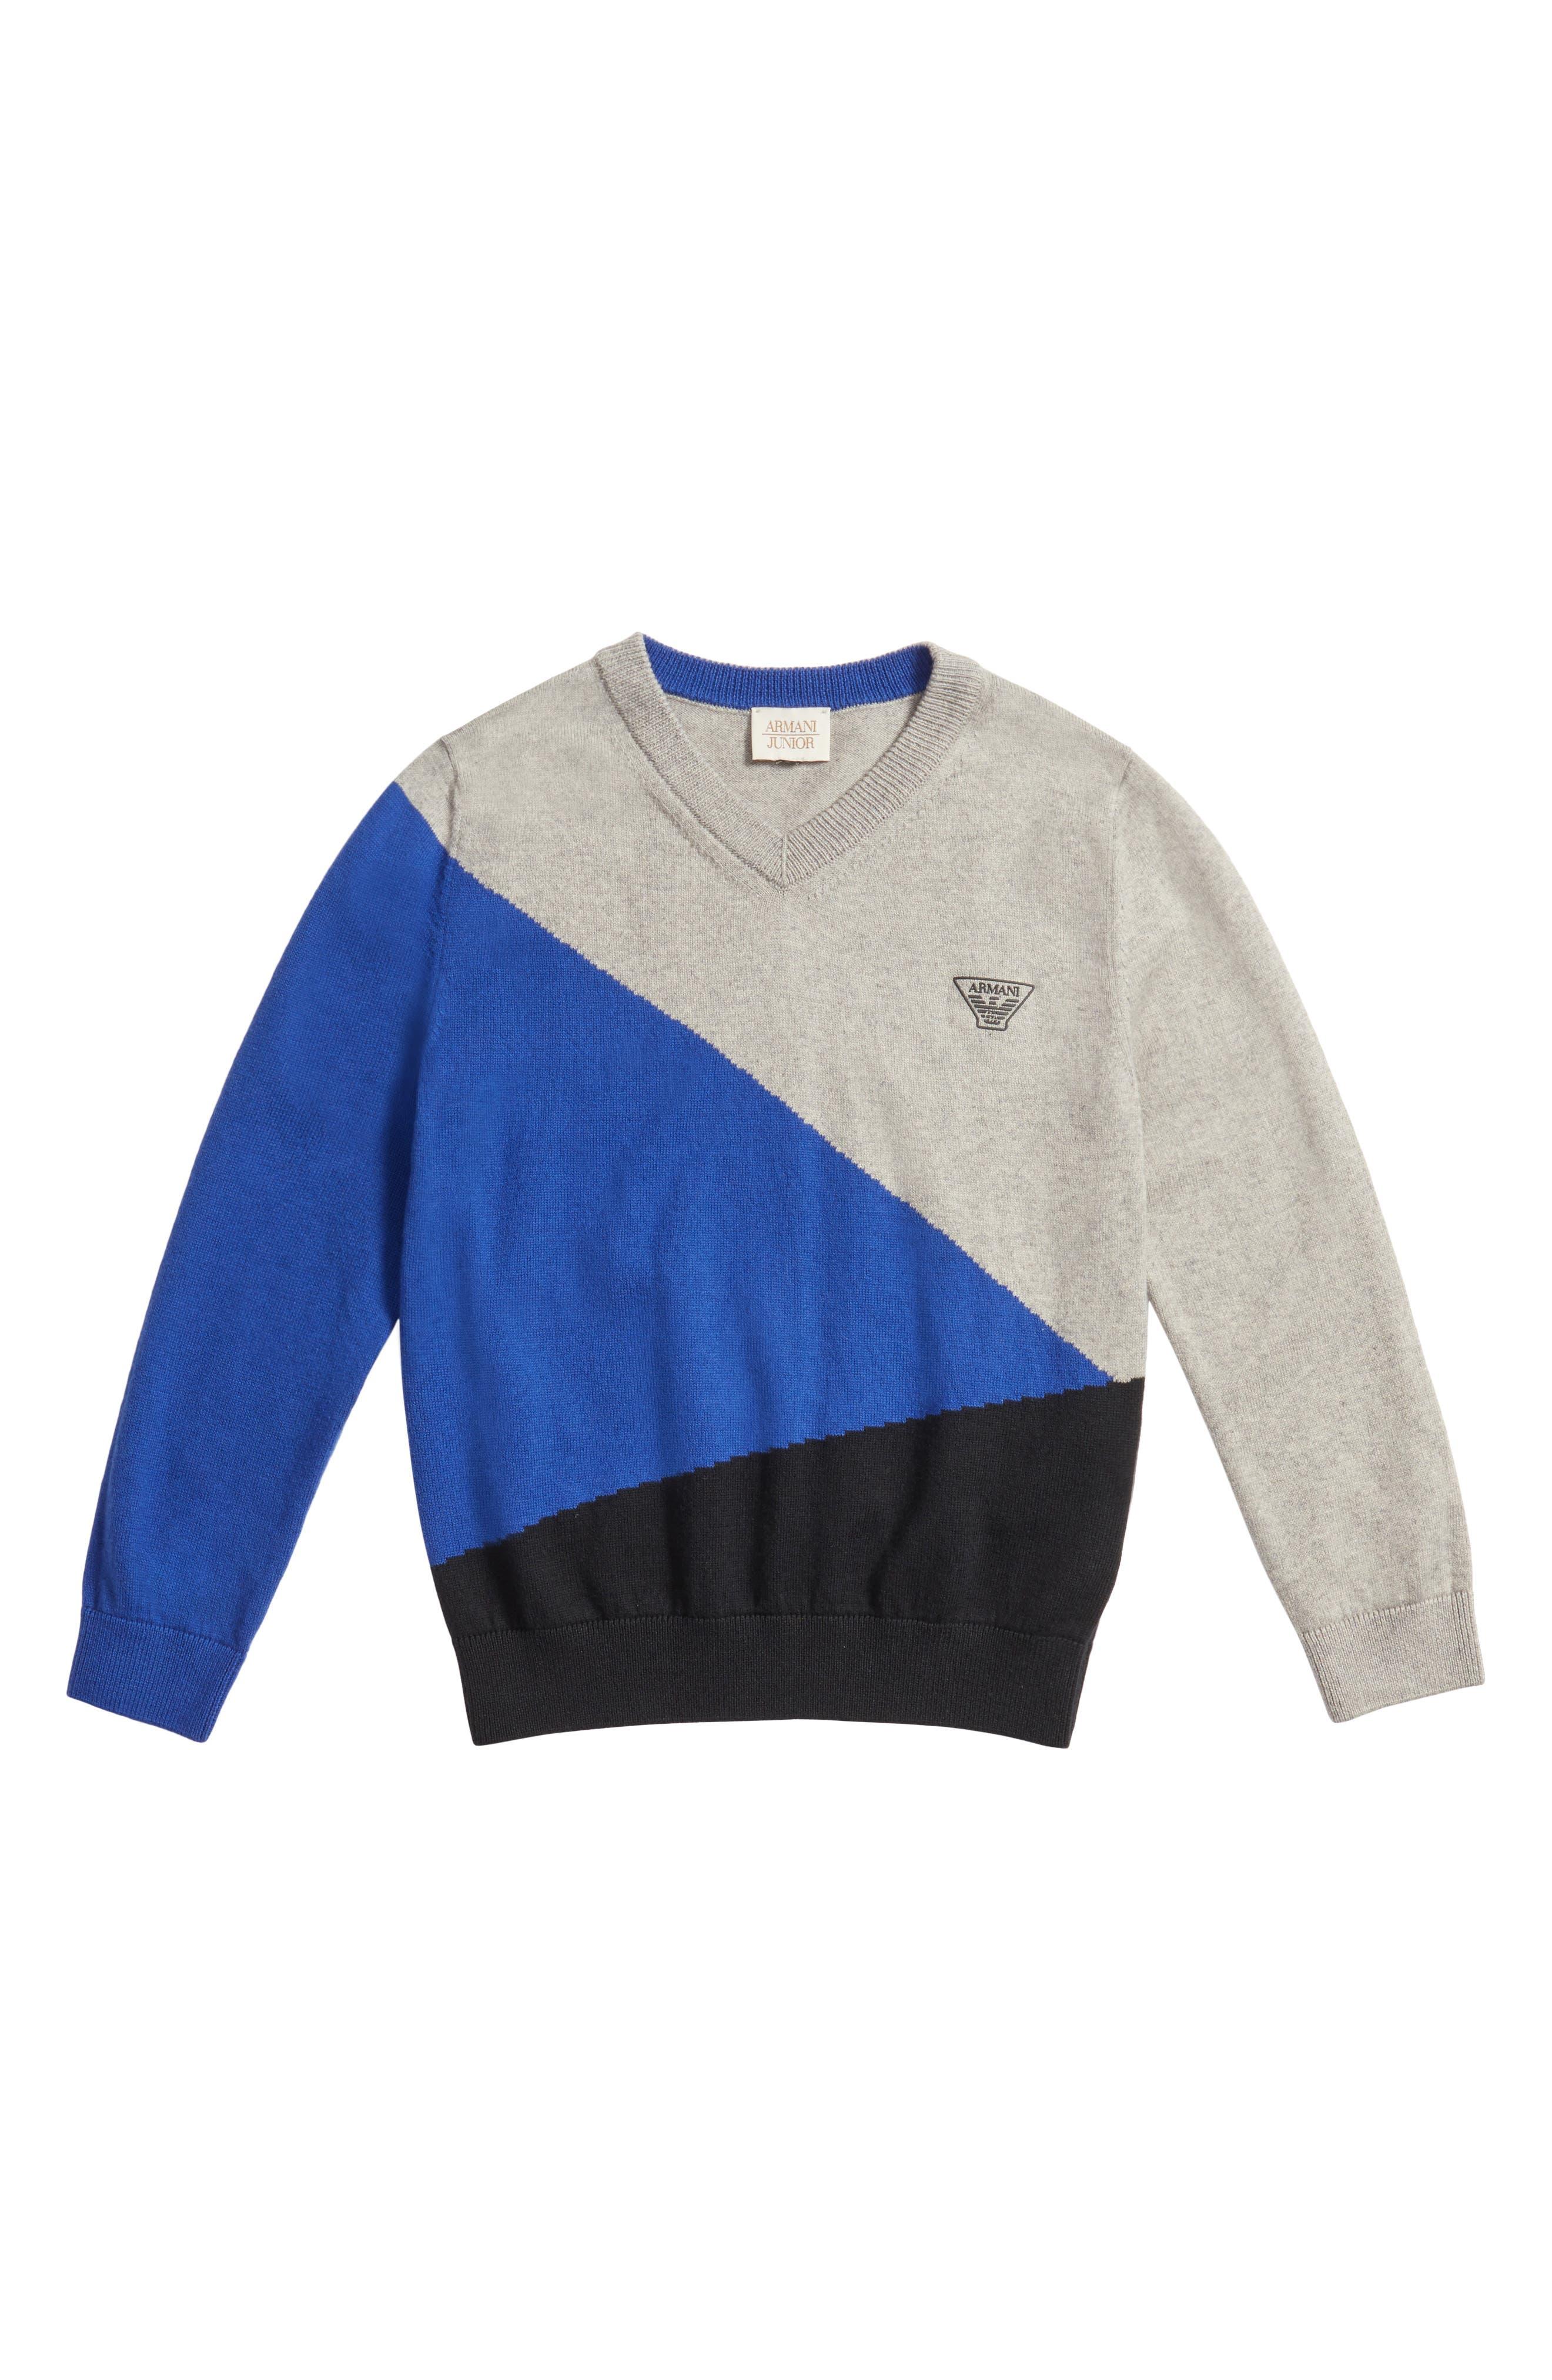 Colorblock Sweater,                         Main,                         color, Black/ Blue